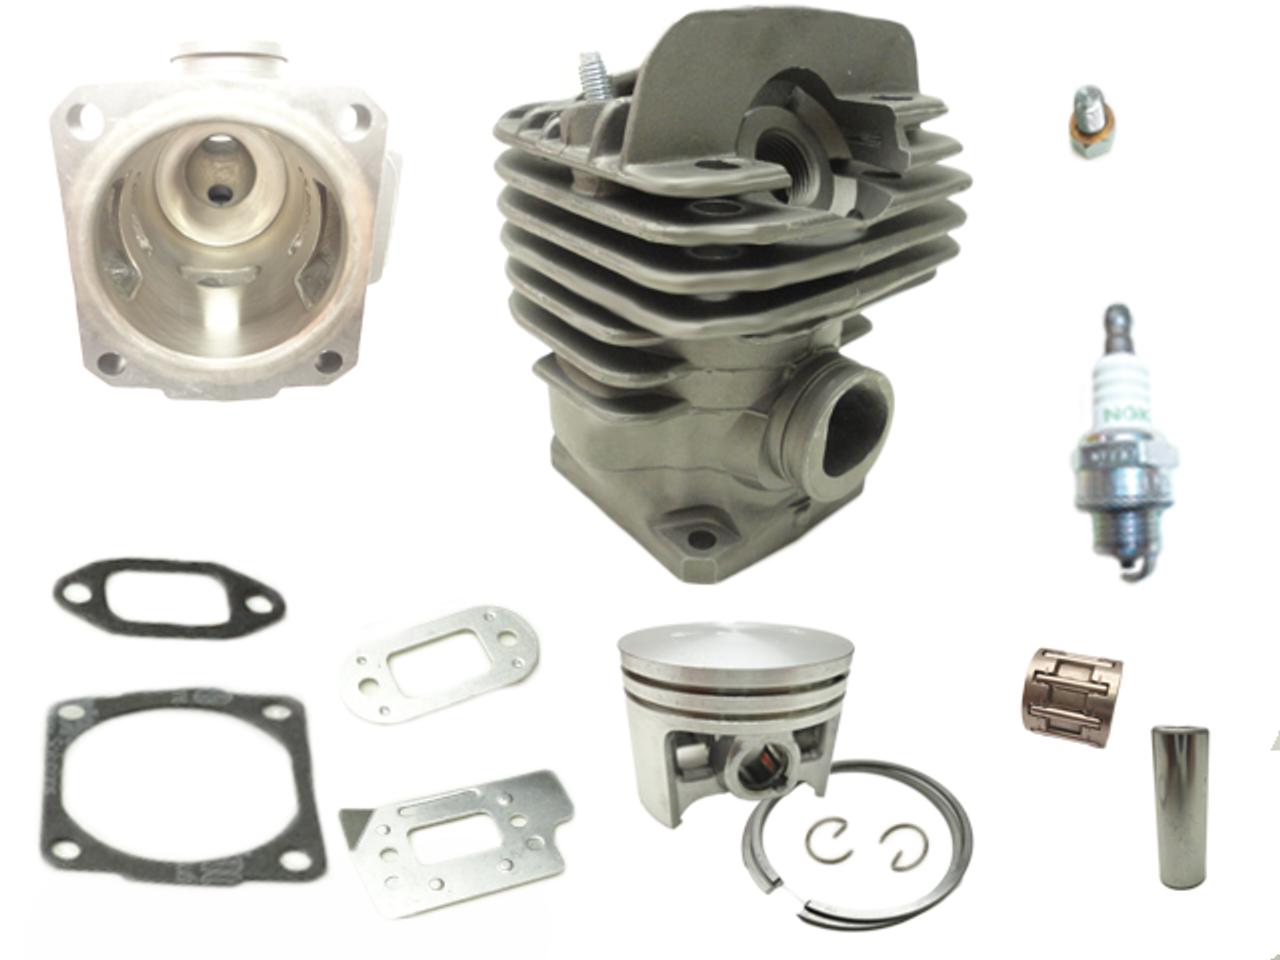 Hyway Stihl 026 Ms 260 44.7Mm Pro Nikasil Cylinder And Piston Ring Assembly Base Kit New